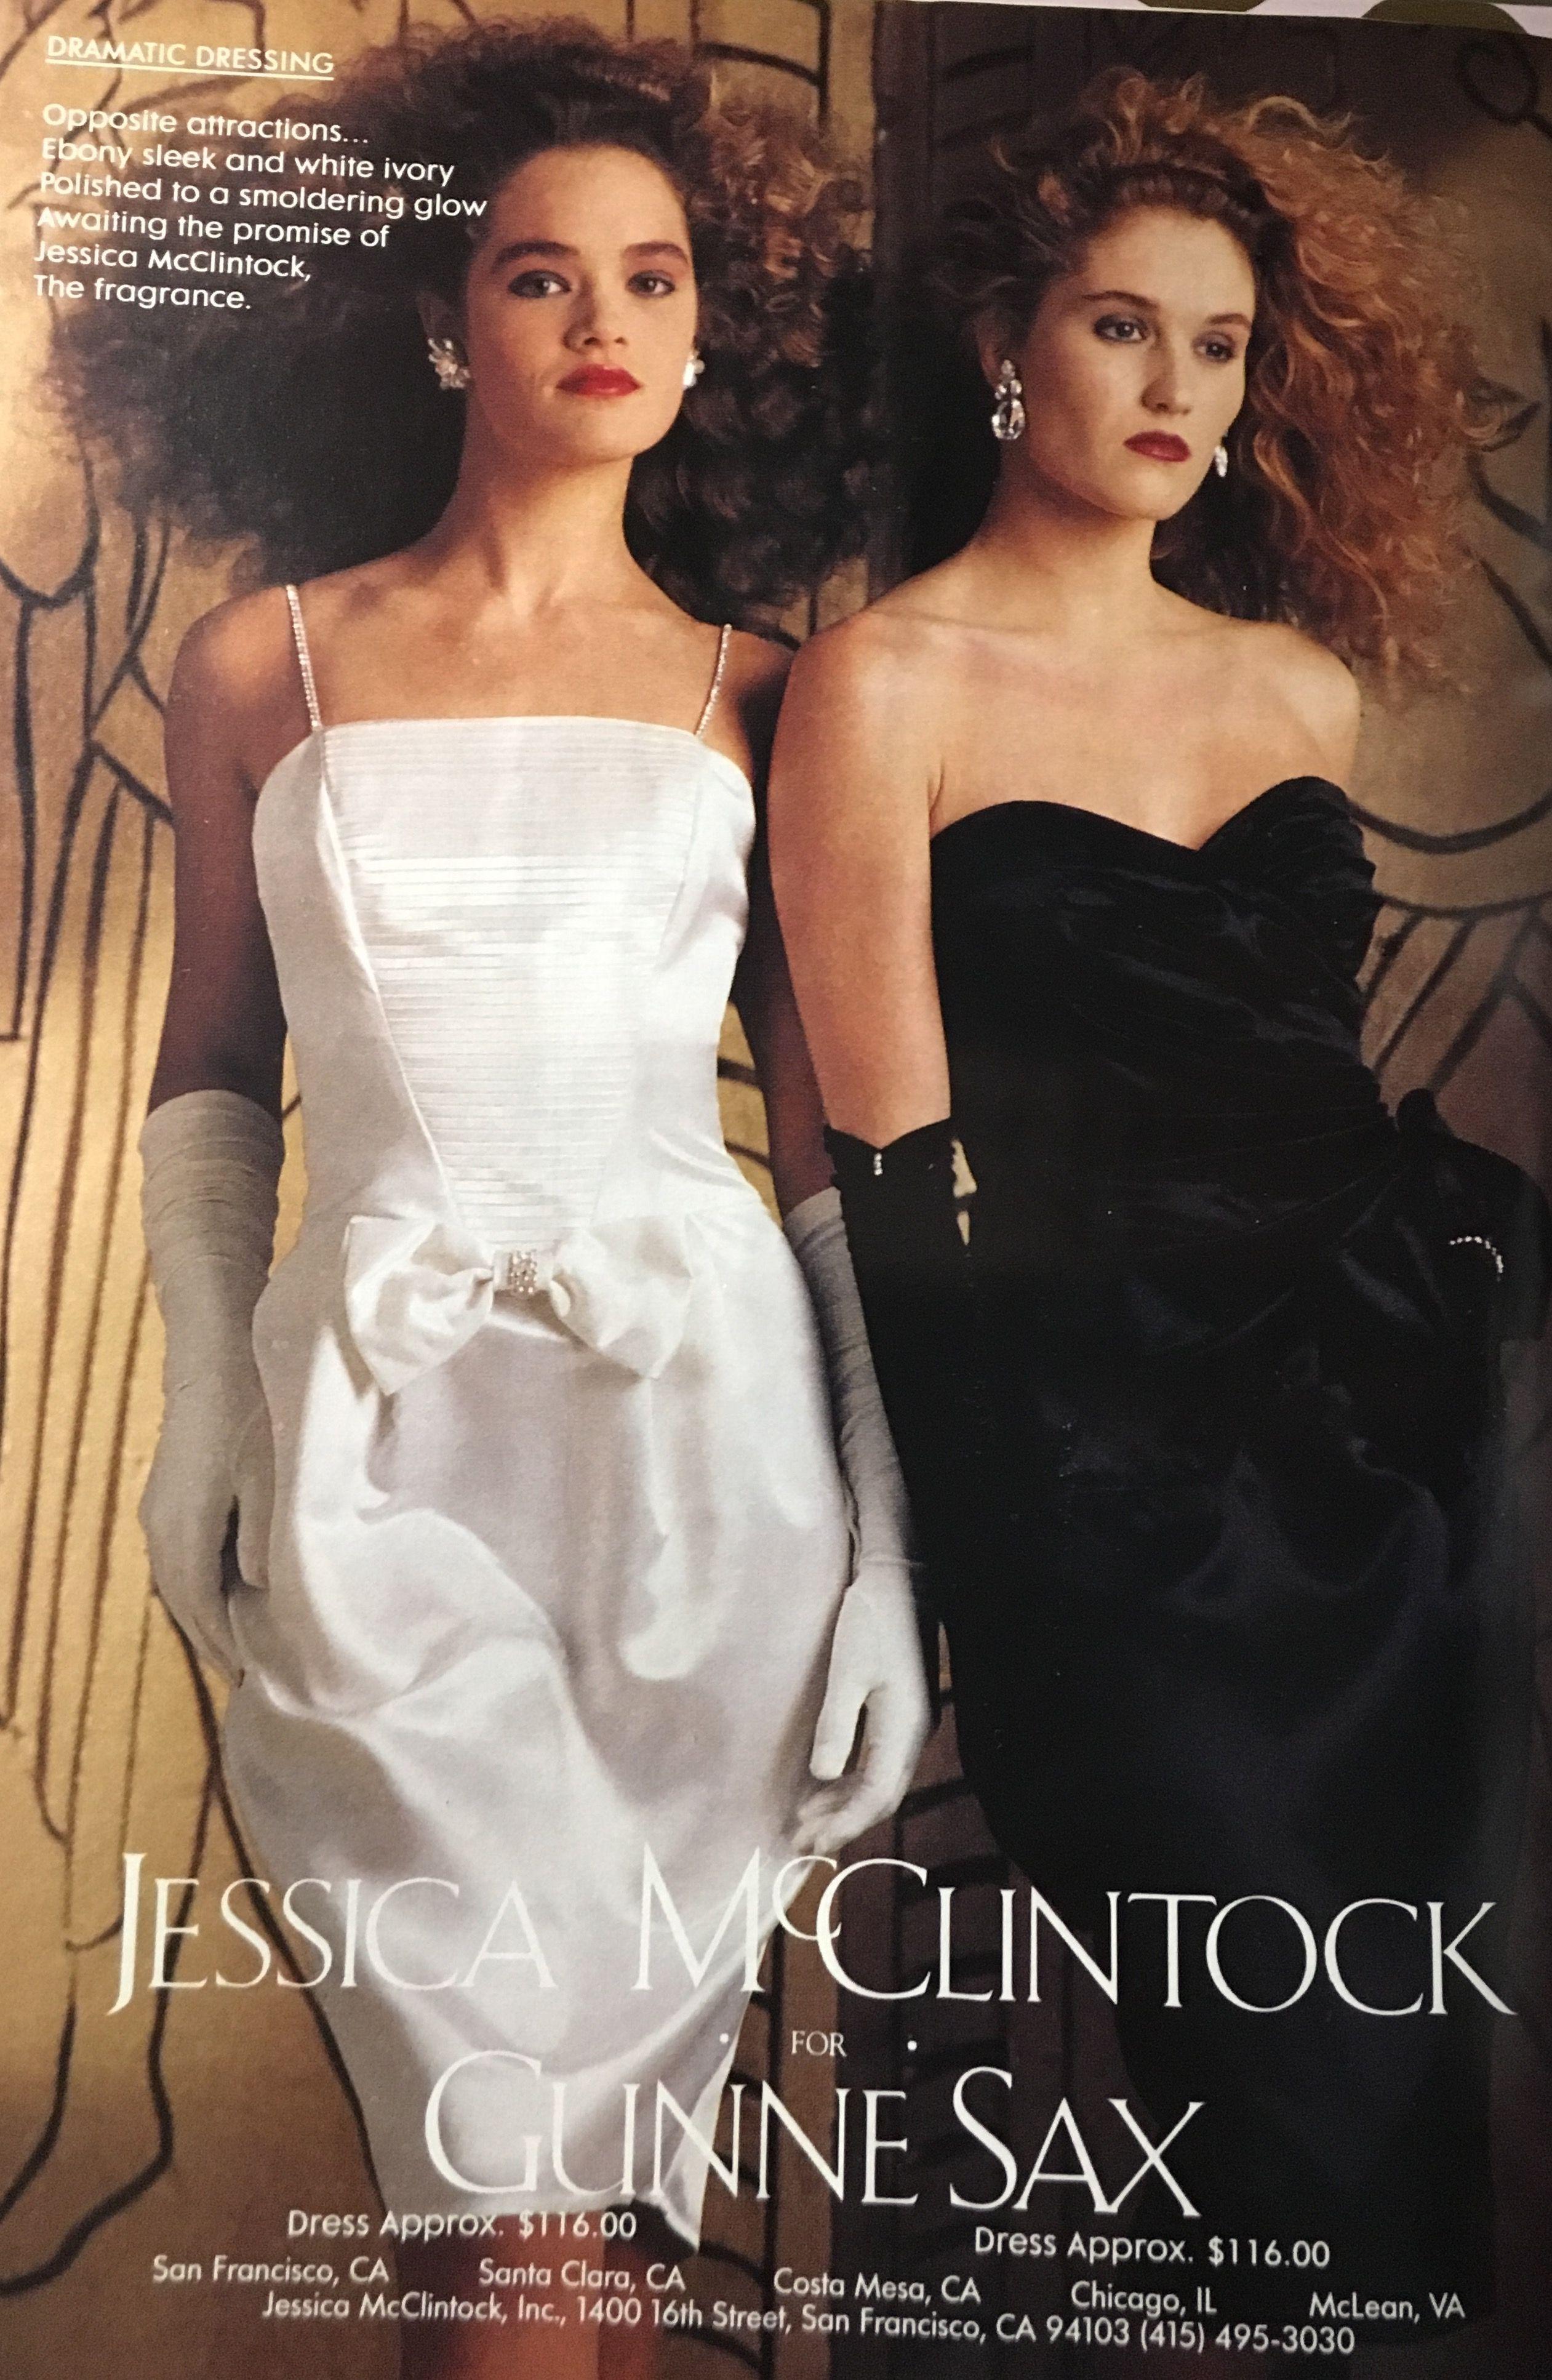 The White Was My Prom Dress 1990 Gunne Sax Seventeen Magazine March 1989 Jessica Mcclintock 80s Prom Dress 80s And 90s Fashion 90s Prom Dresses [ 3867 x 2522 Pixel ]